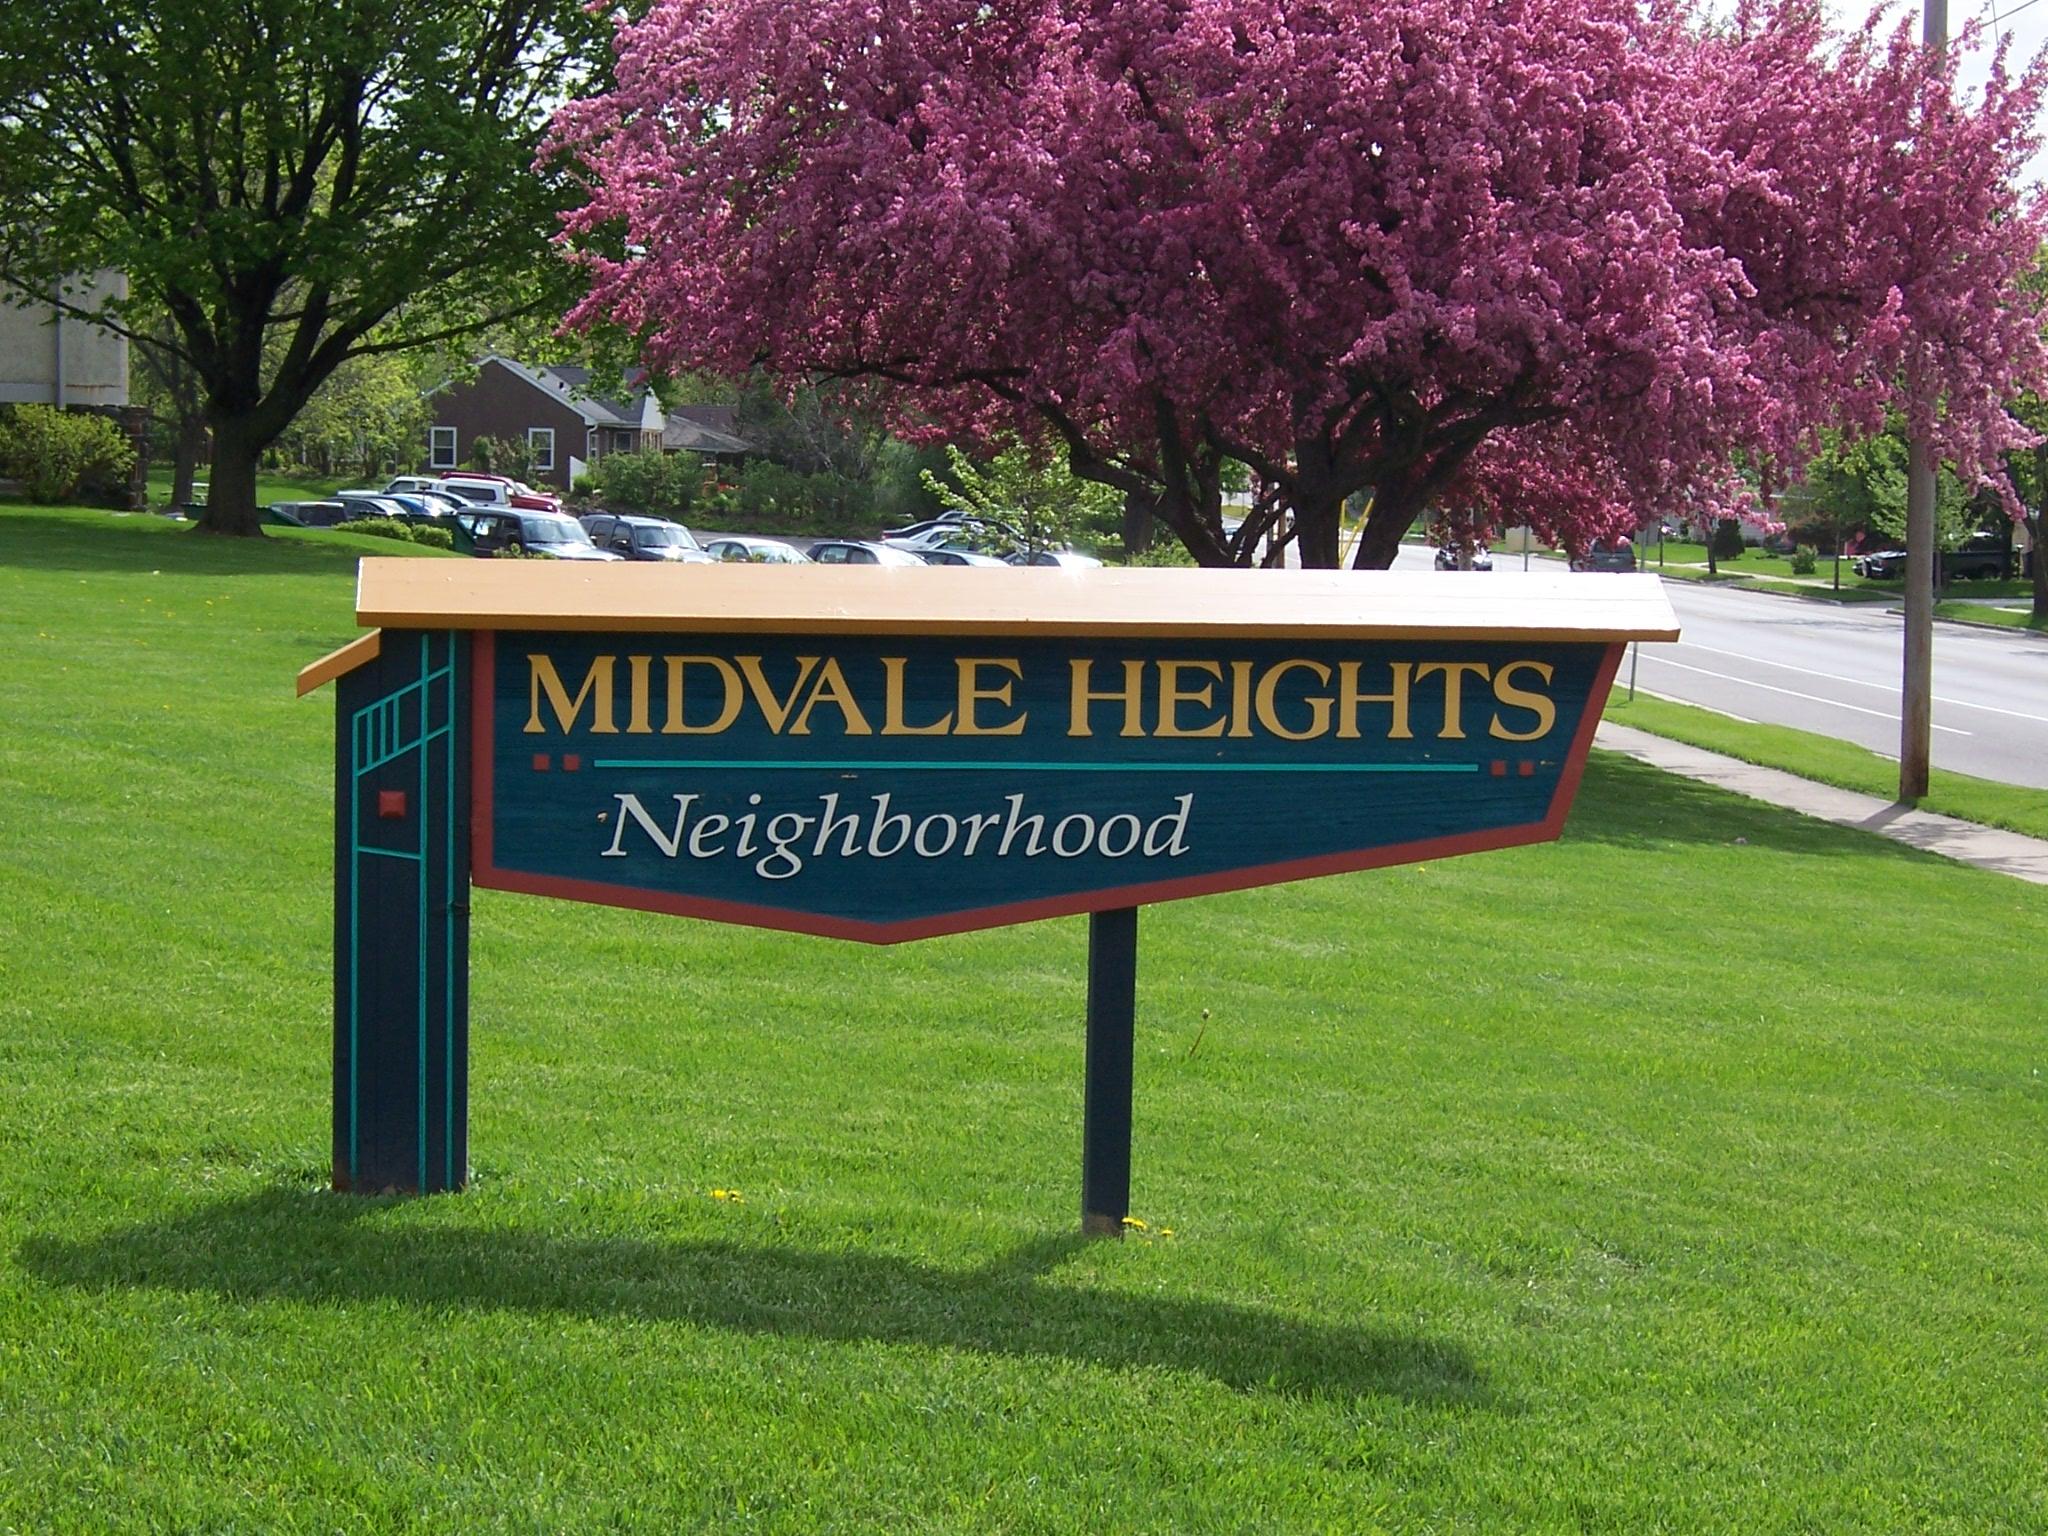 Neighborhood_midvale_heights.JPG